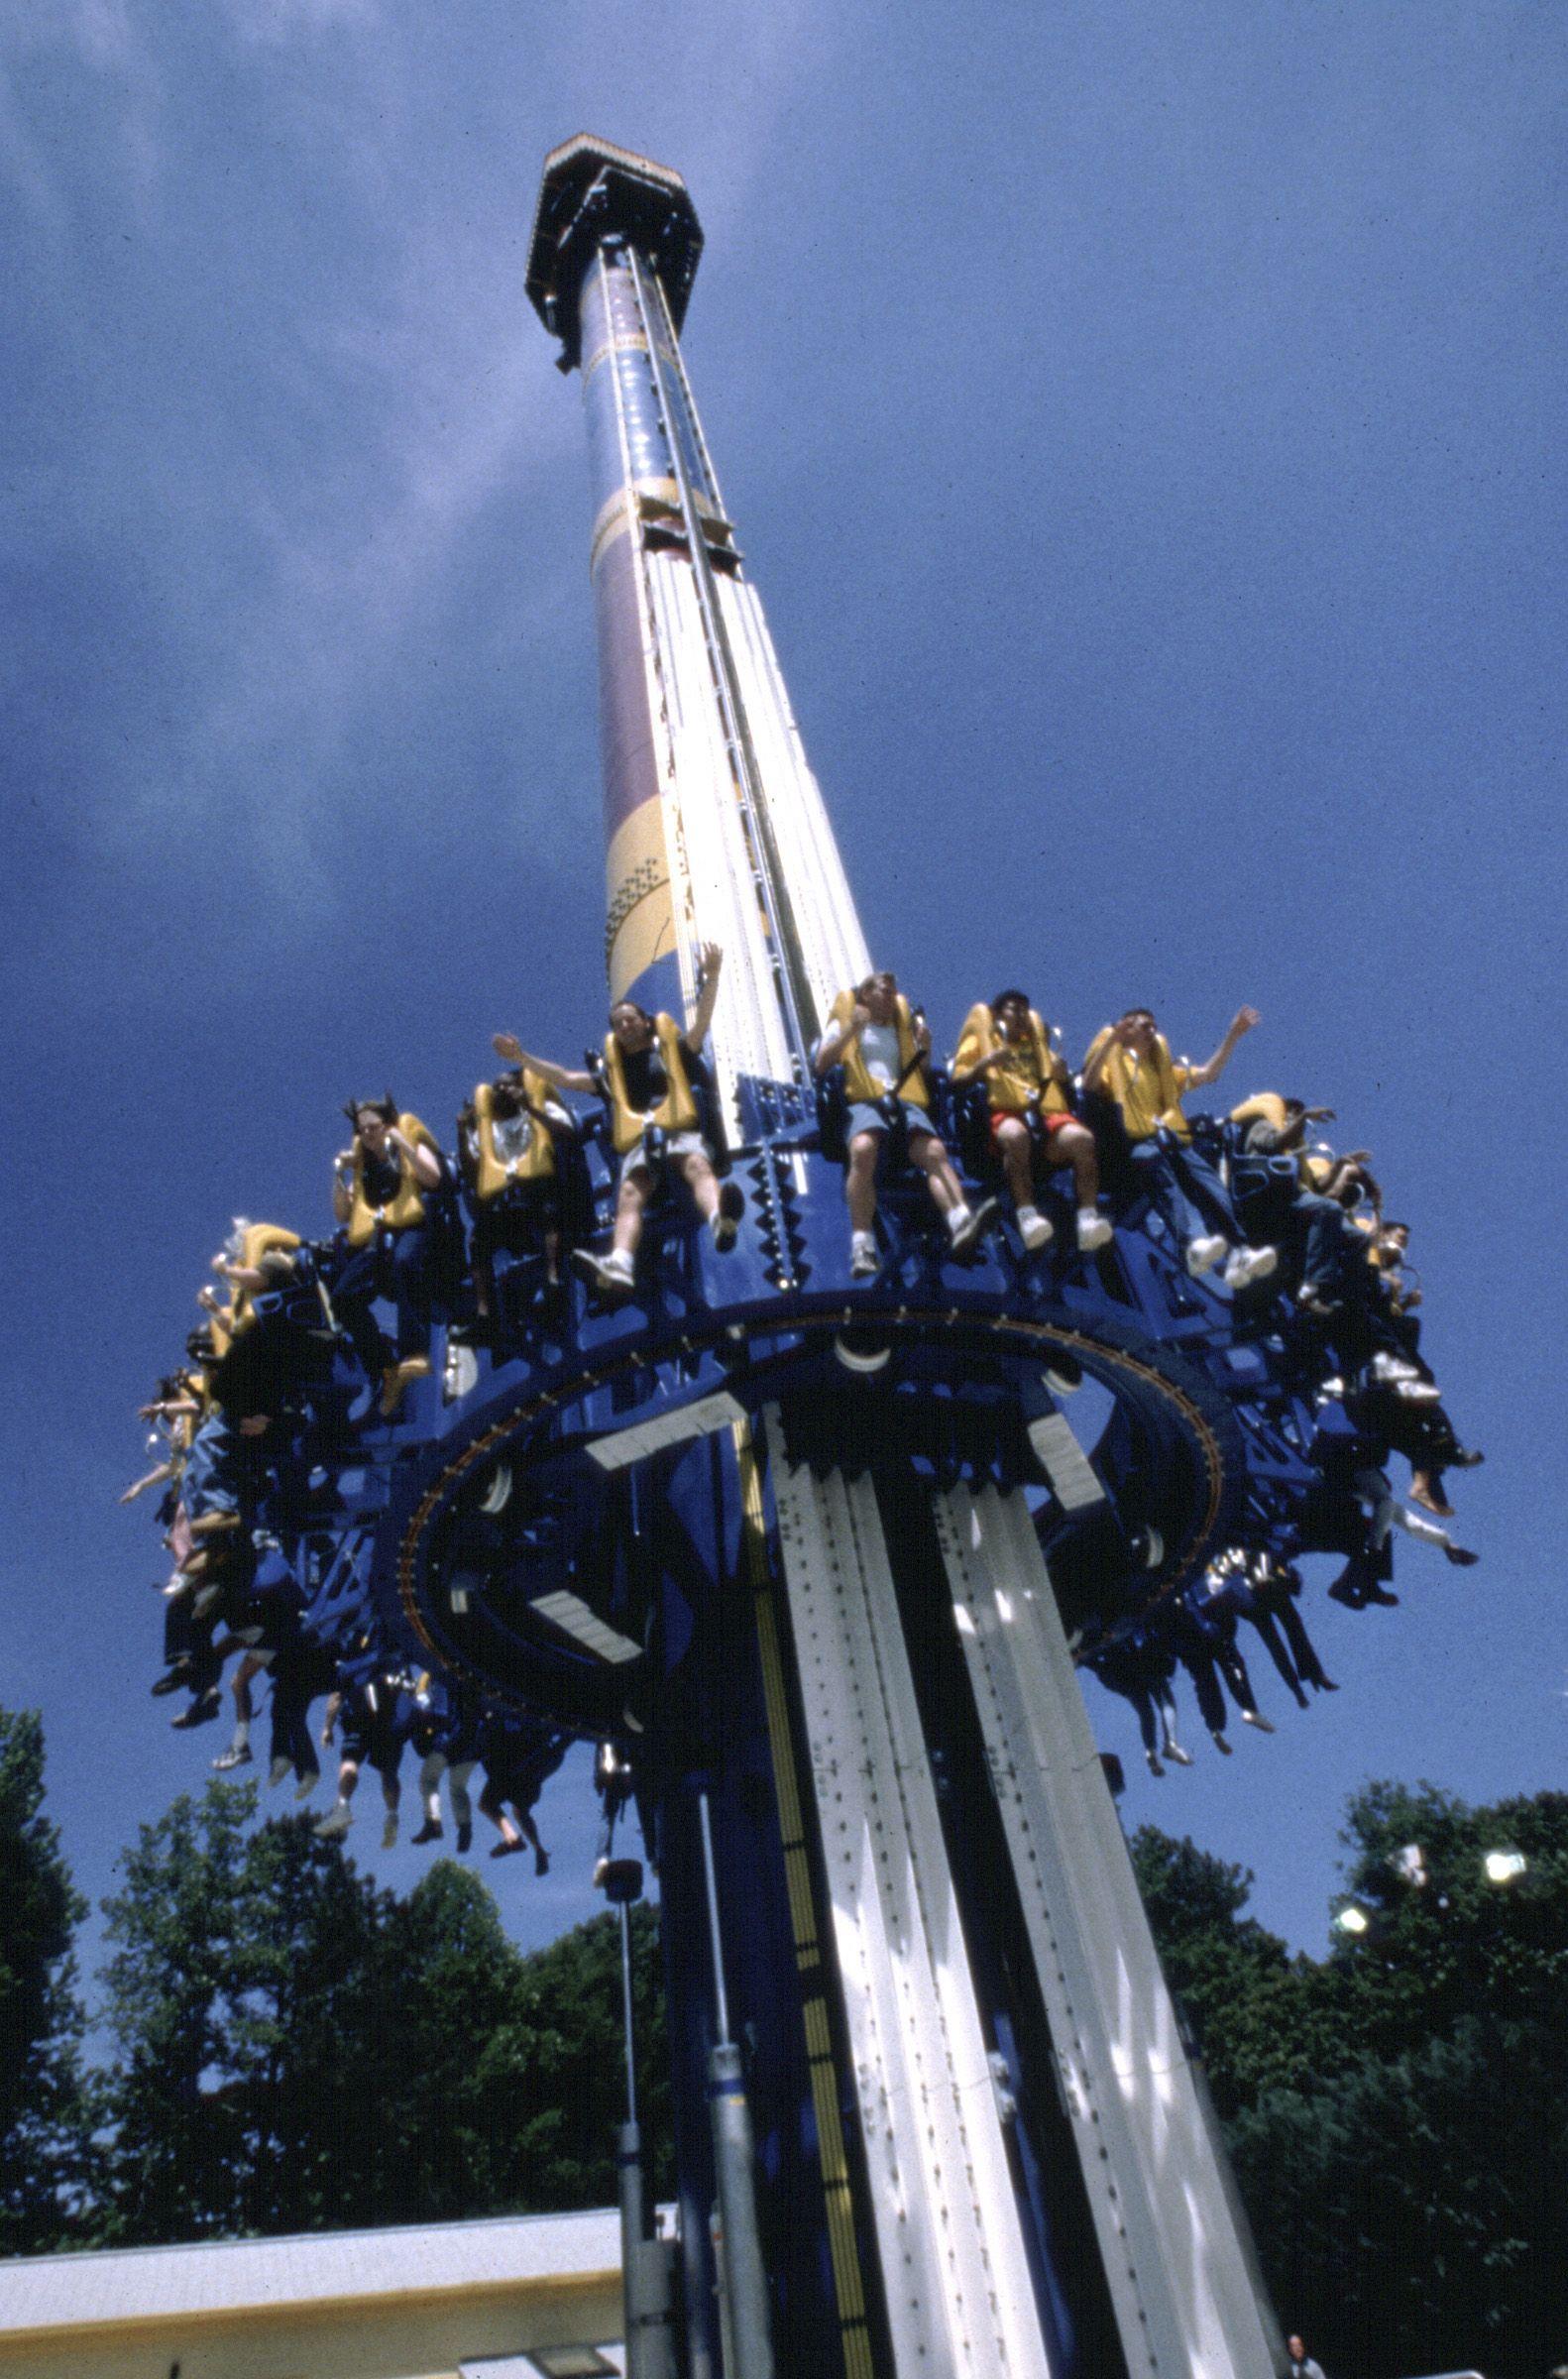 Pin By Jaelyn Baskett On Amusement Park Rides Amusment Parks Rides Amusement Park Rides Carnival Rides